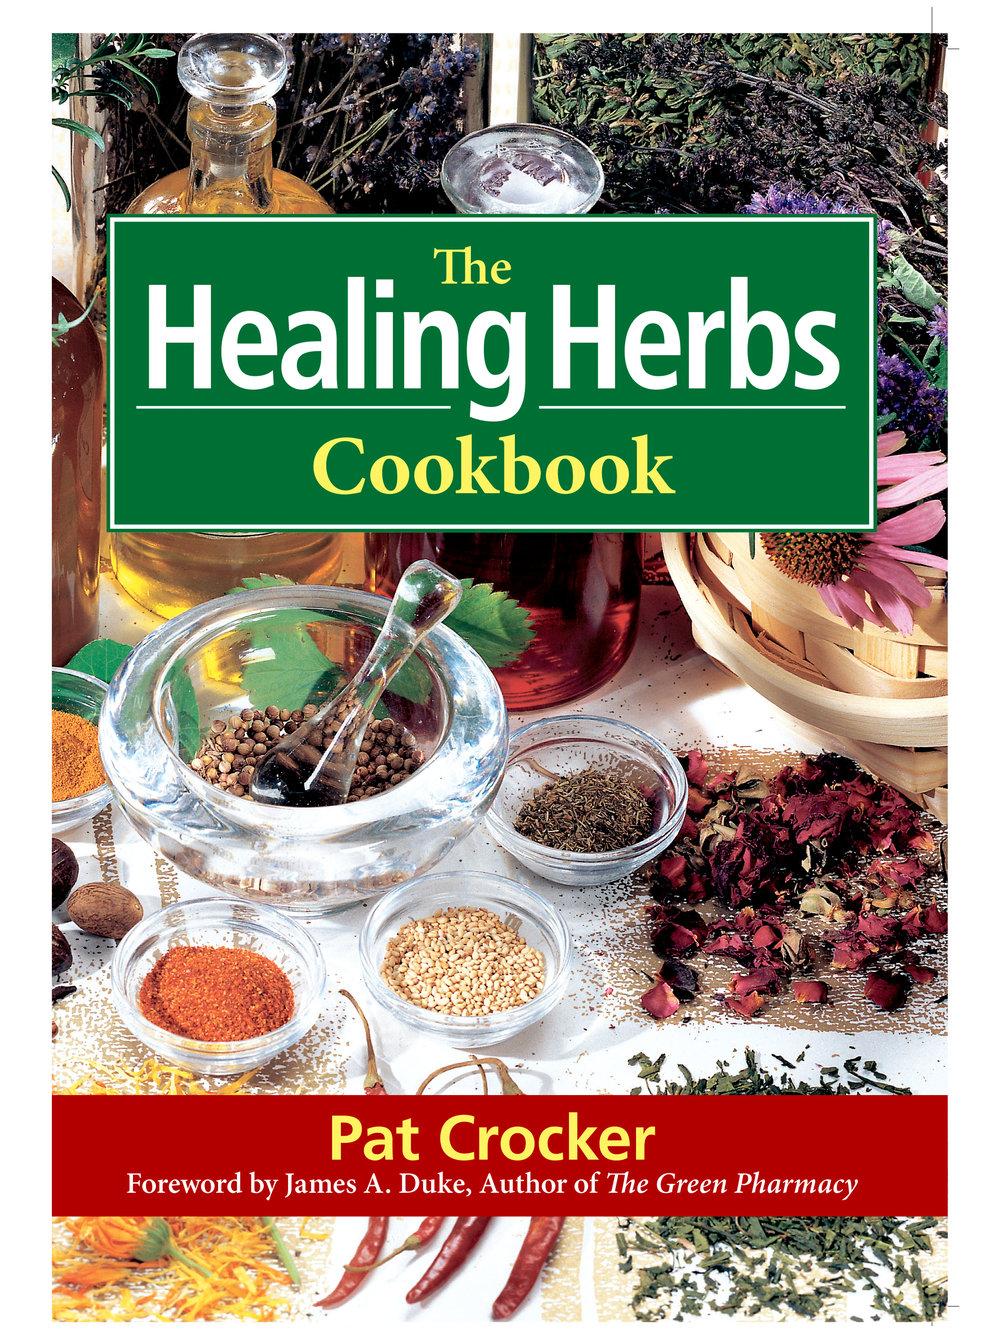 The Healing Herbs Cookbook by Pat Crocker